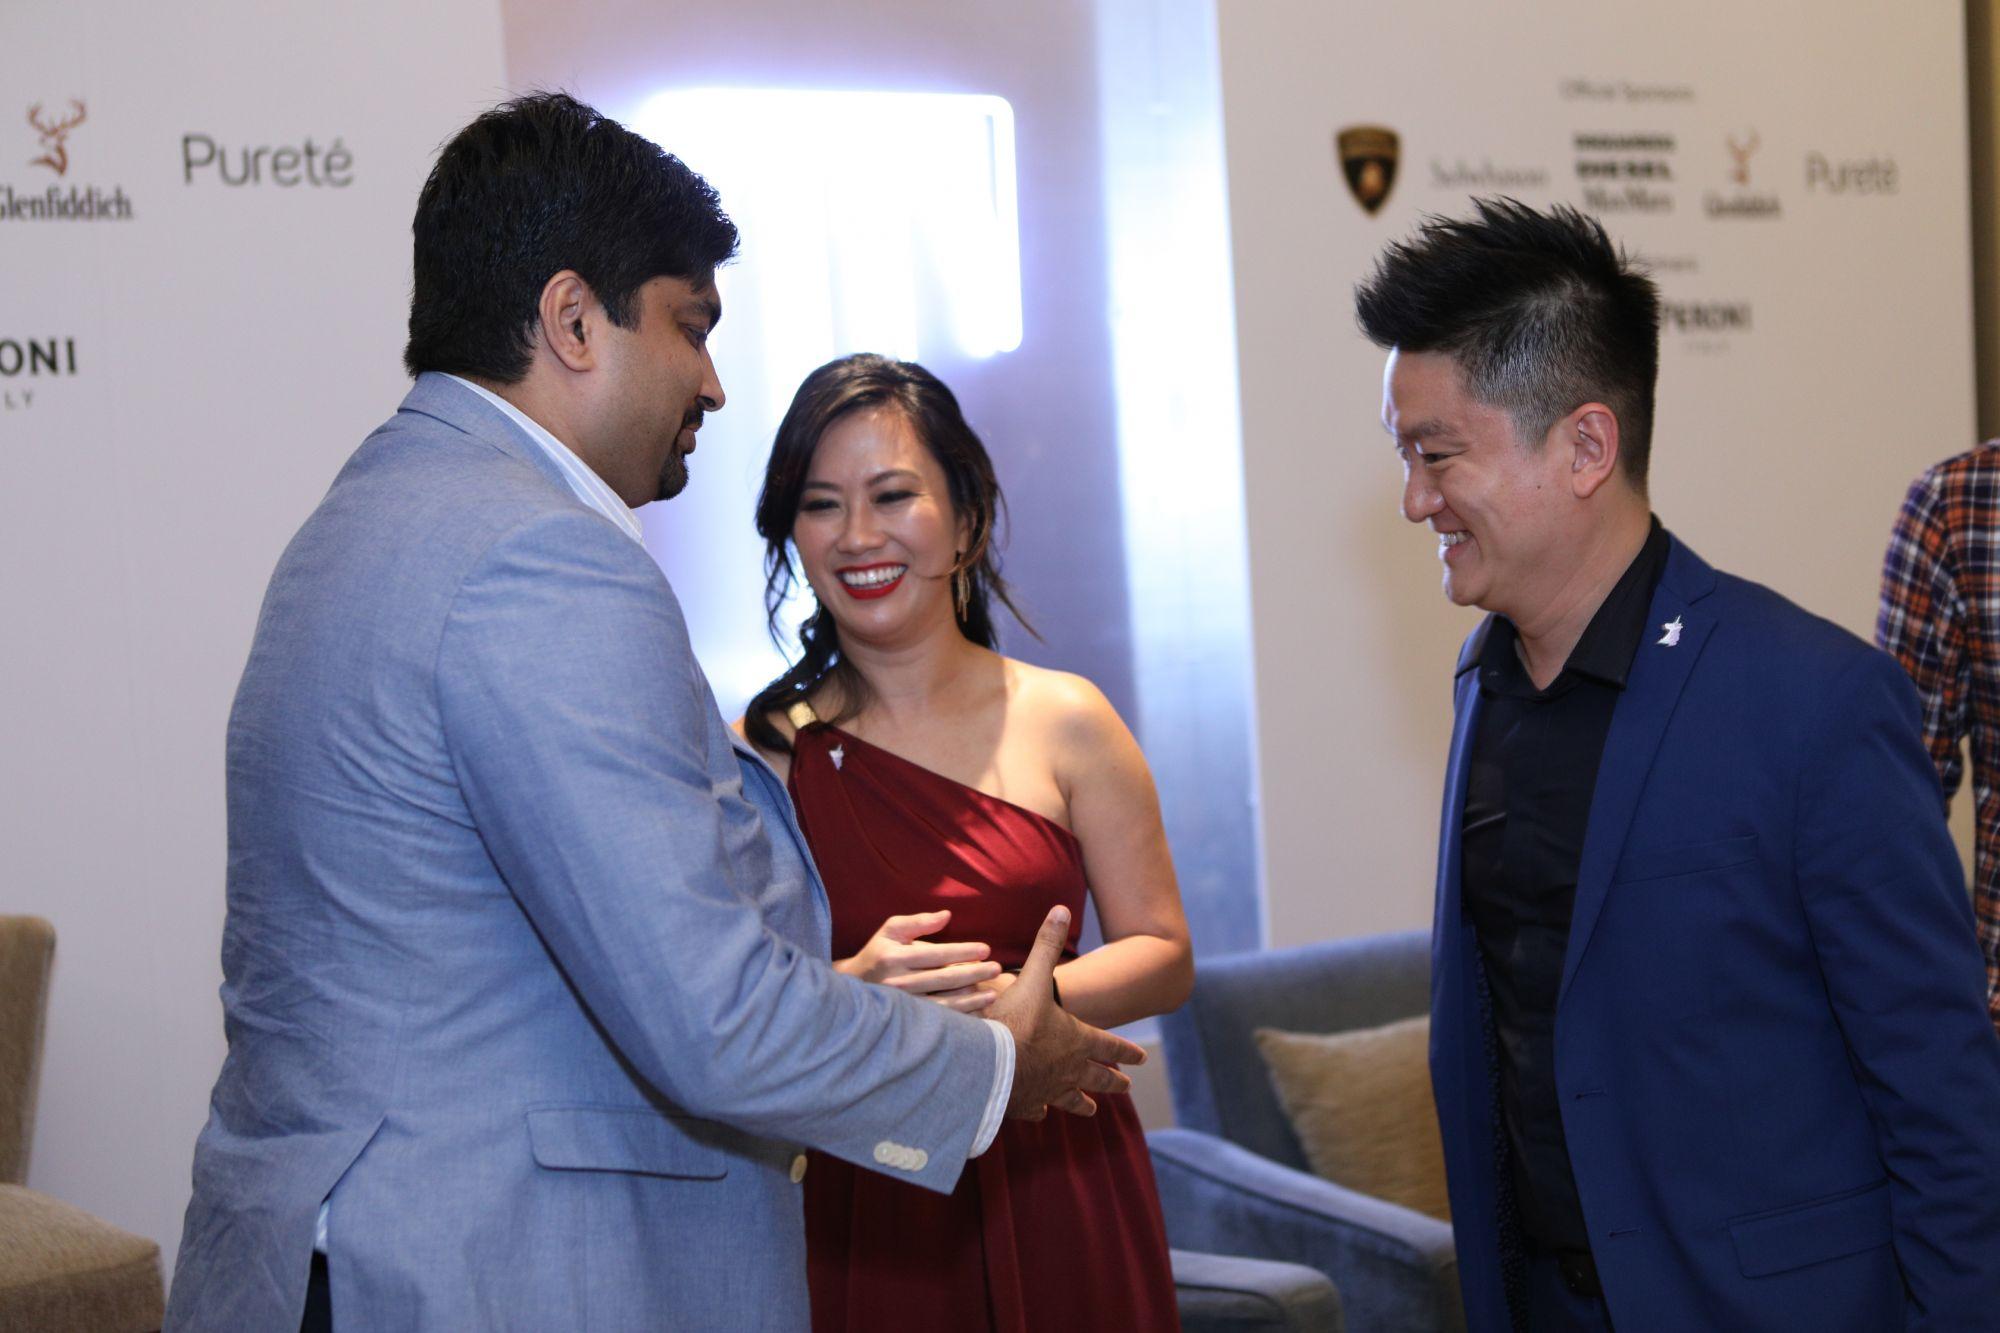 Shashank Dixit, Cherilyn Tan, Tan Szue Hann